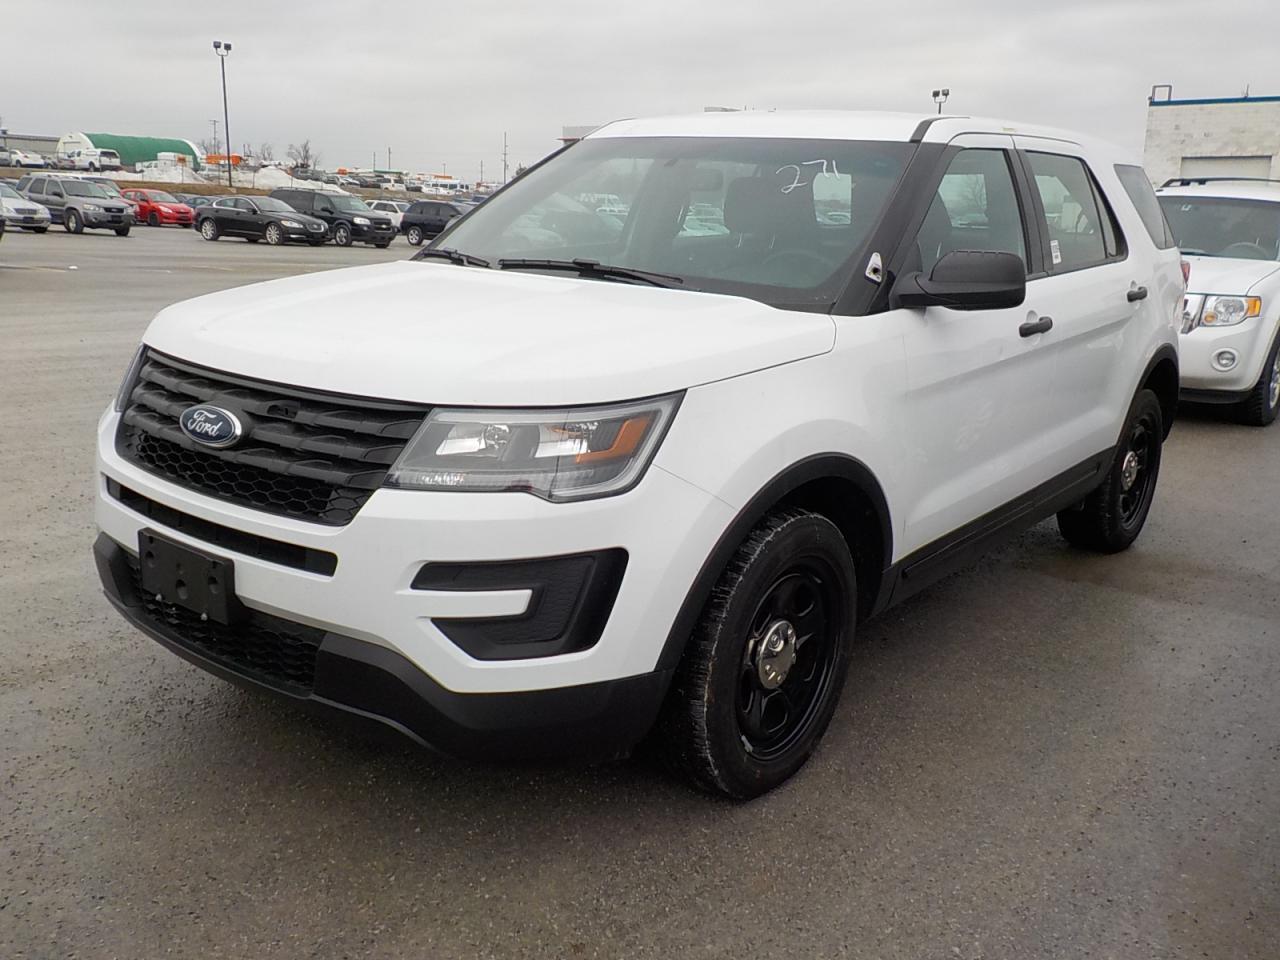 Photo of White 2017 Ford Explorer